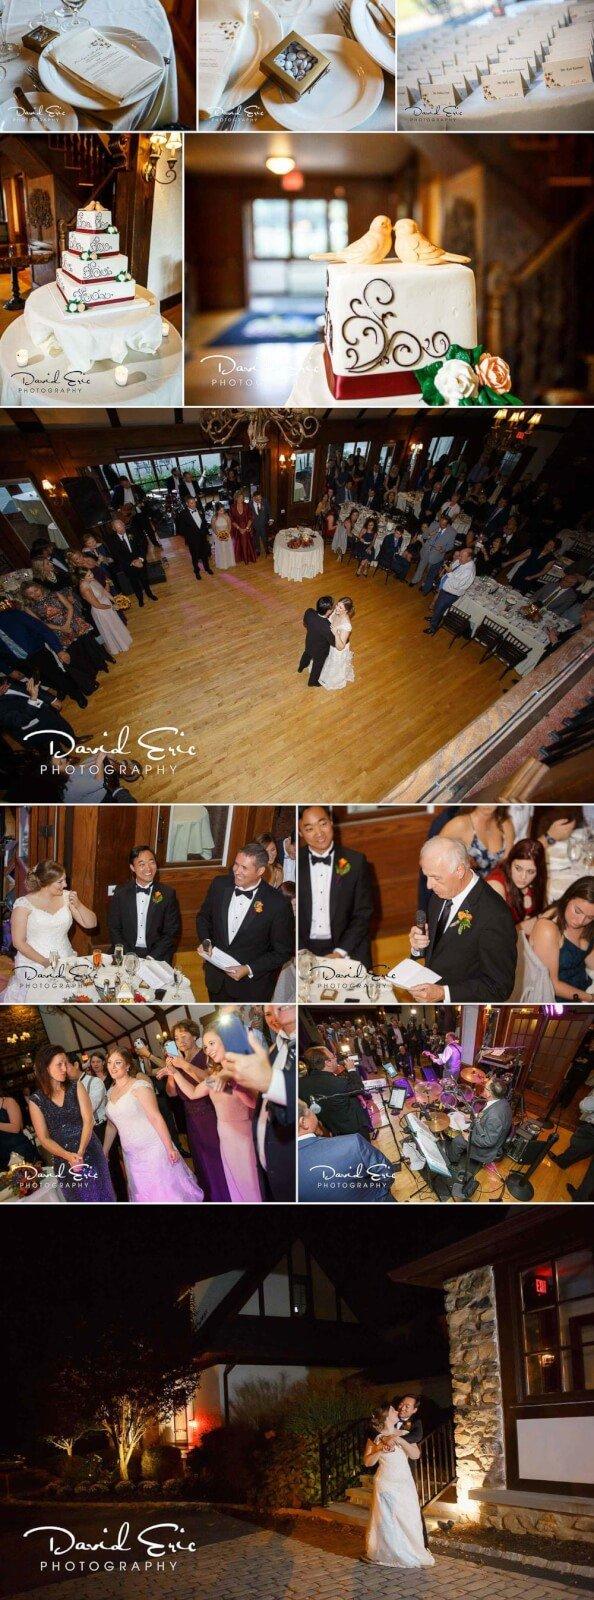 Lake Valhalla Club photos of the reception and festivites